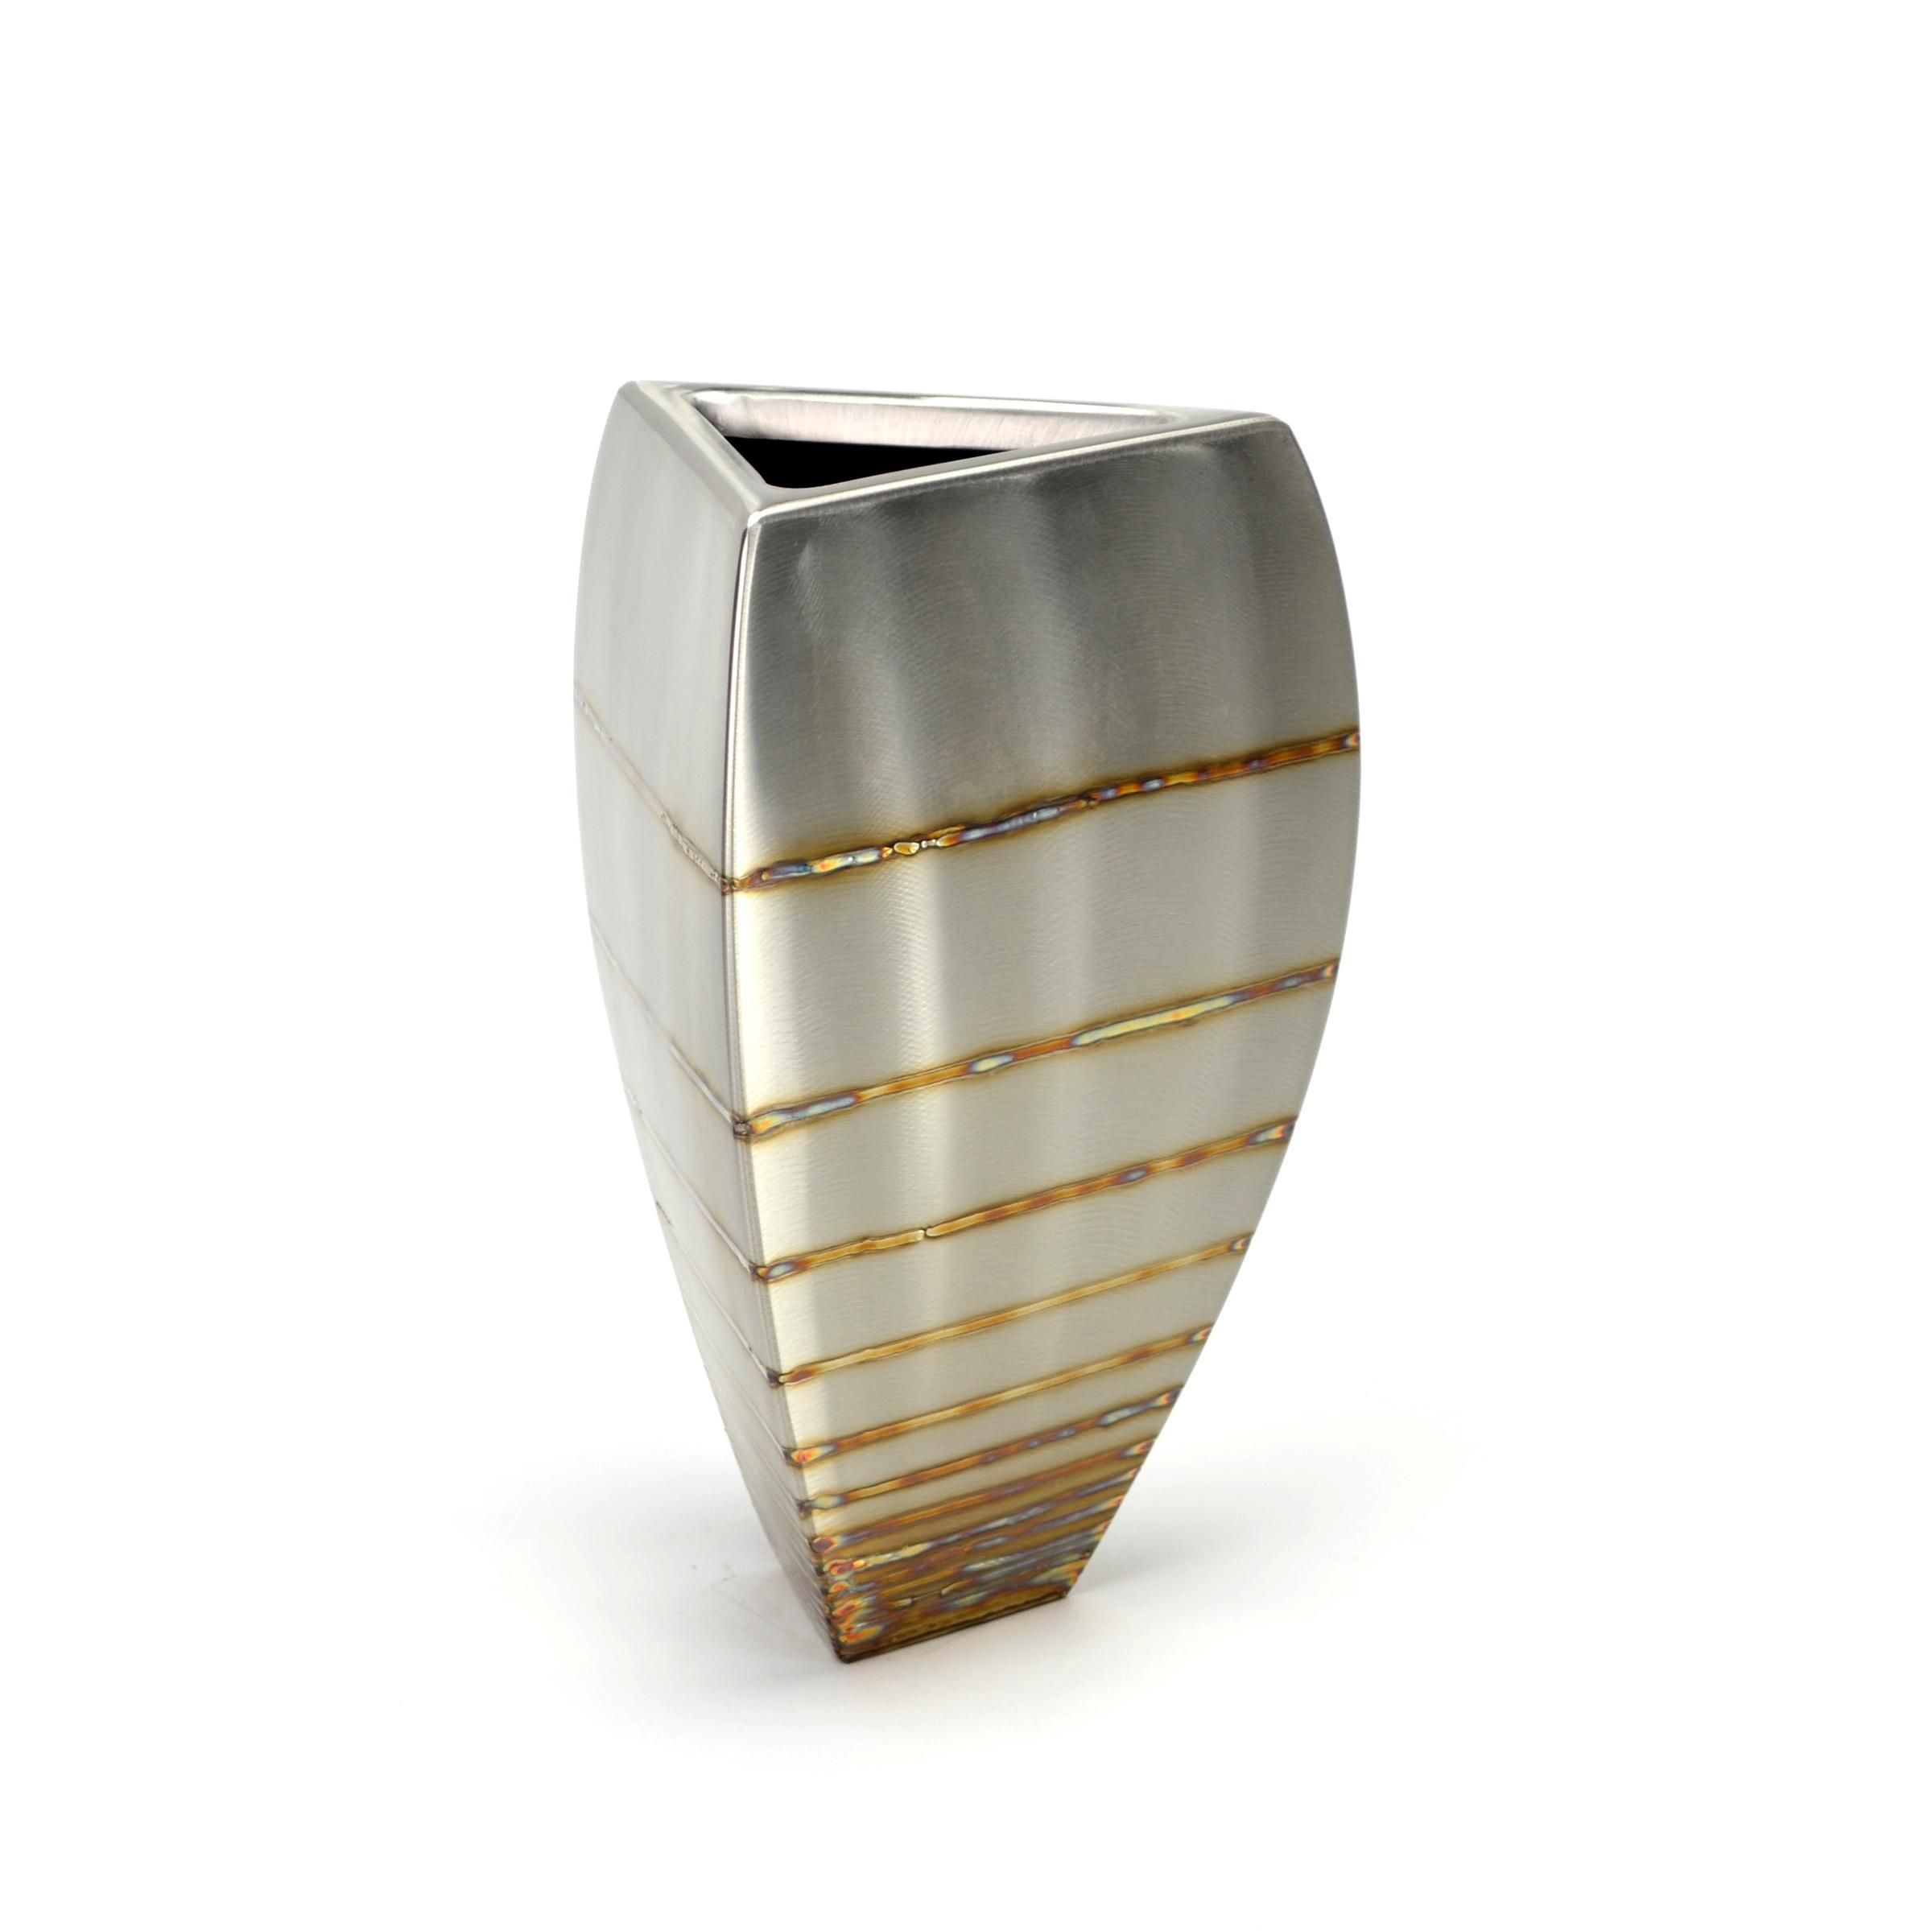 "Tri-Bowl - graduated stripe , 10 x 7"" x 7"", Stainless Steel"